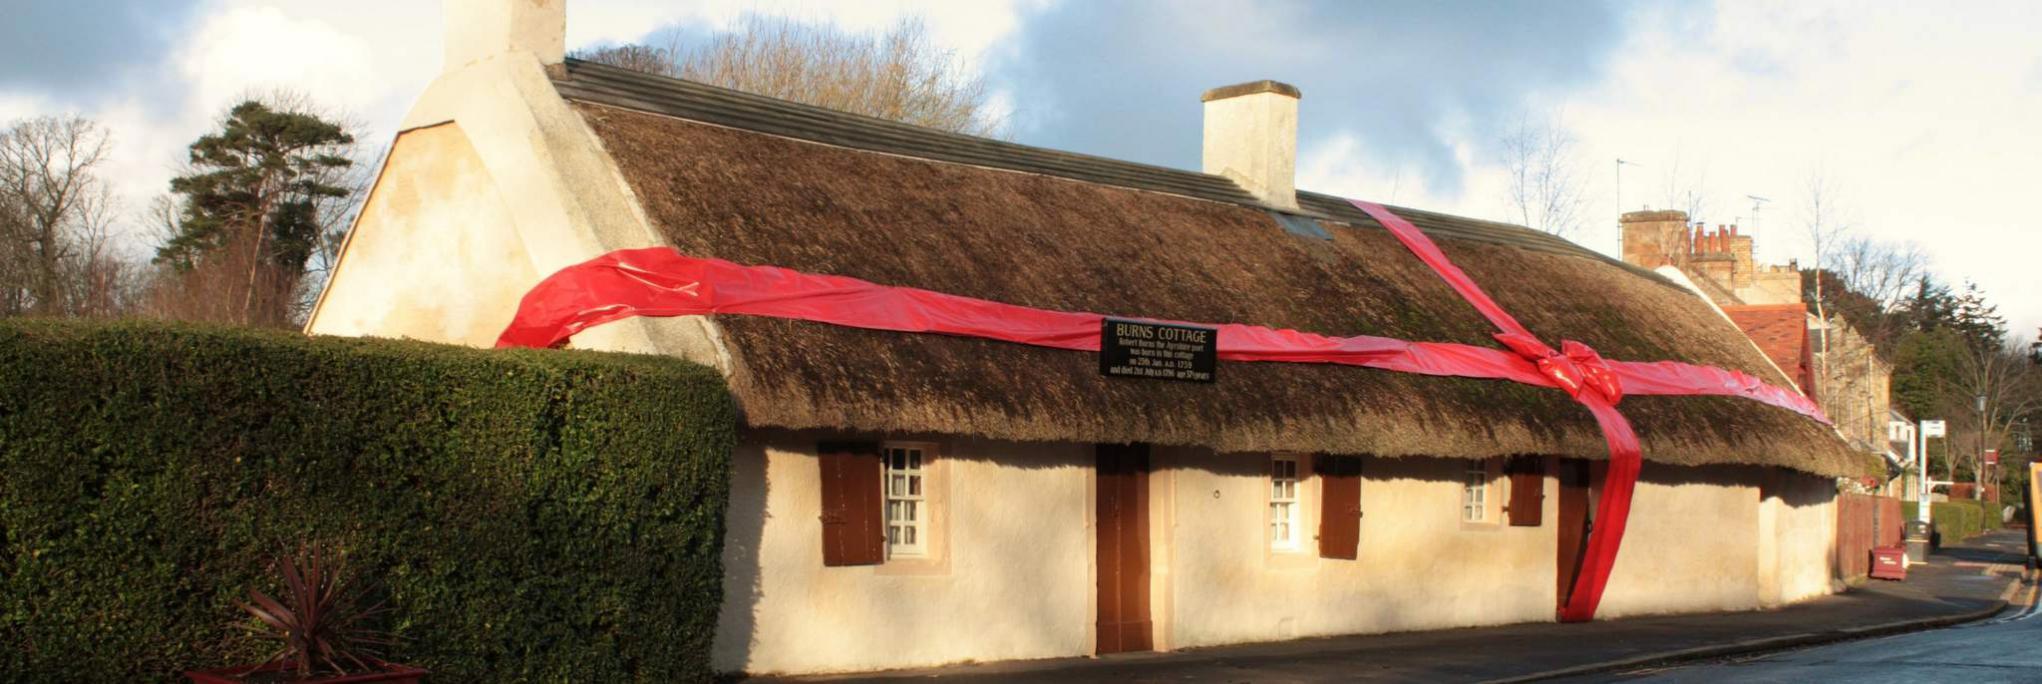 Robert Burns Birthplace Museum Alloway